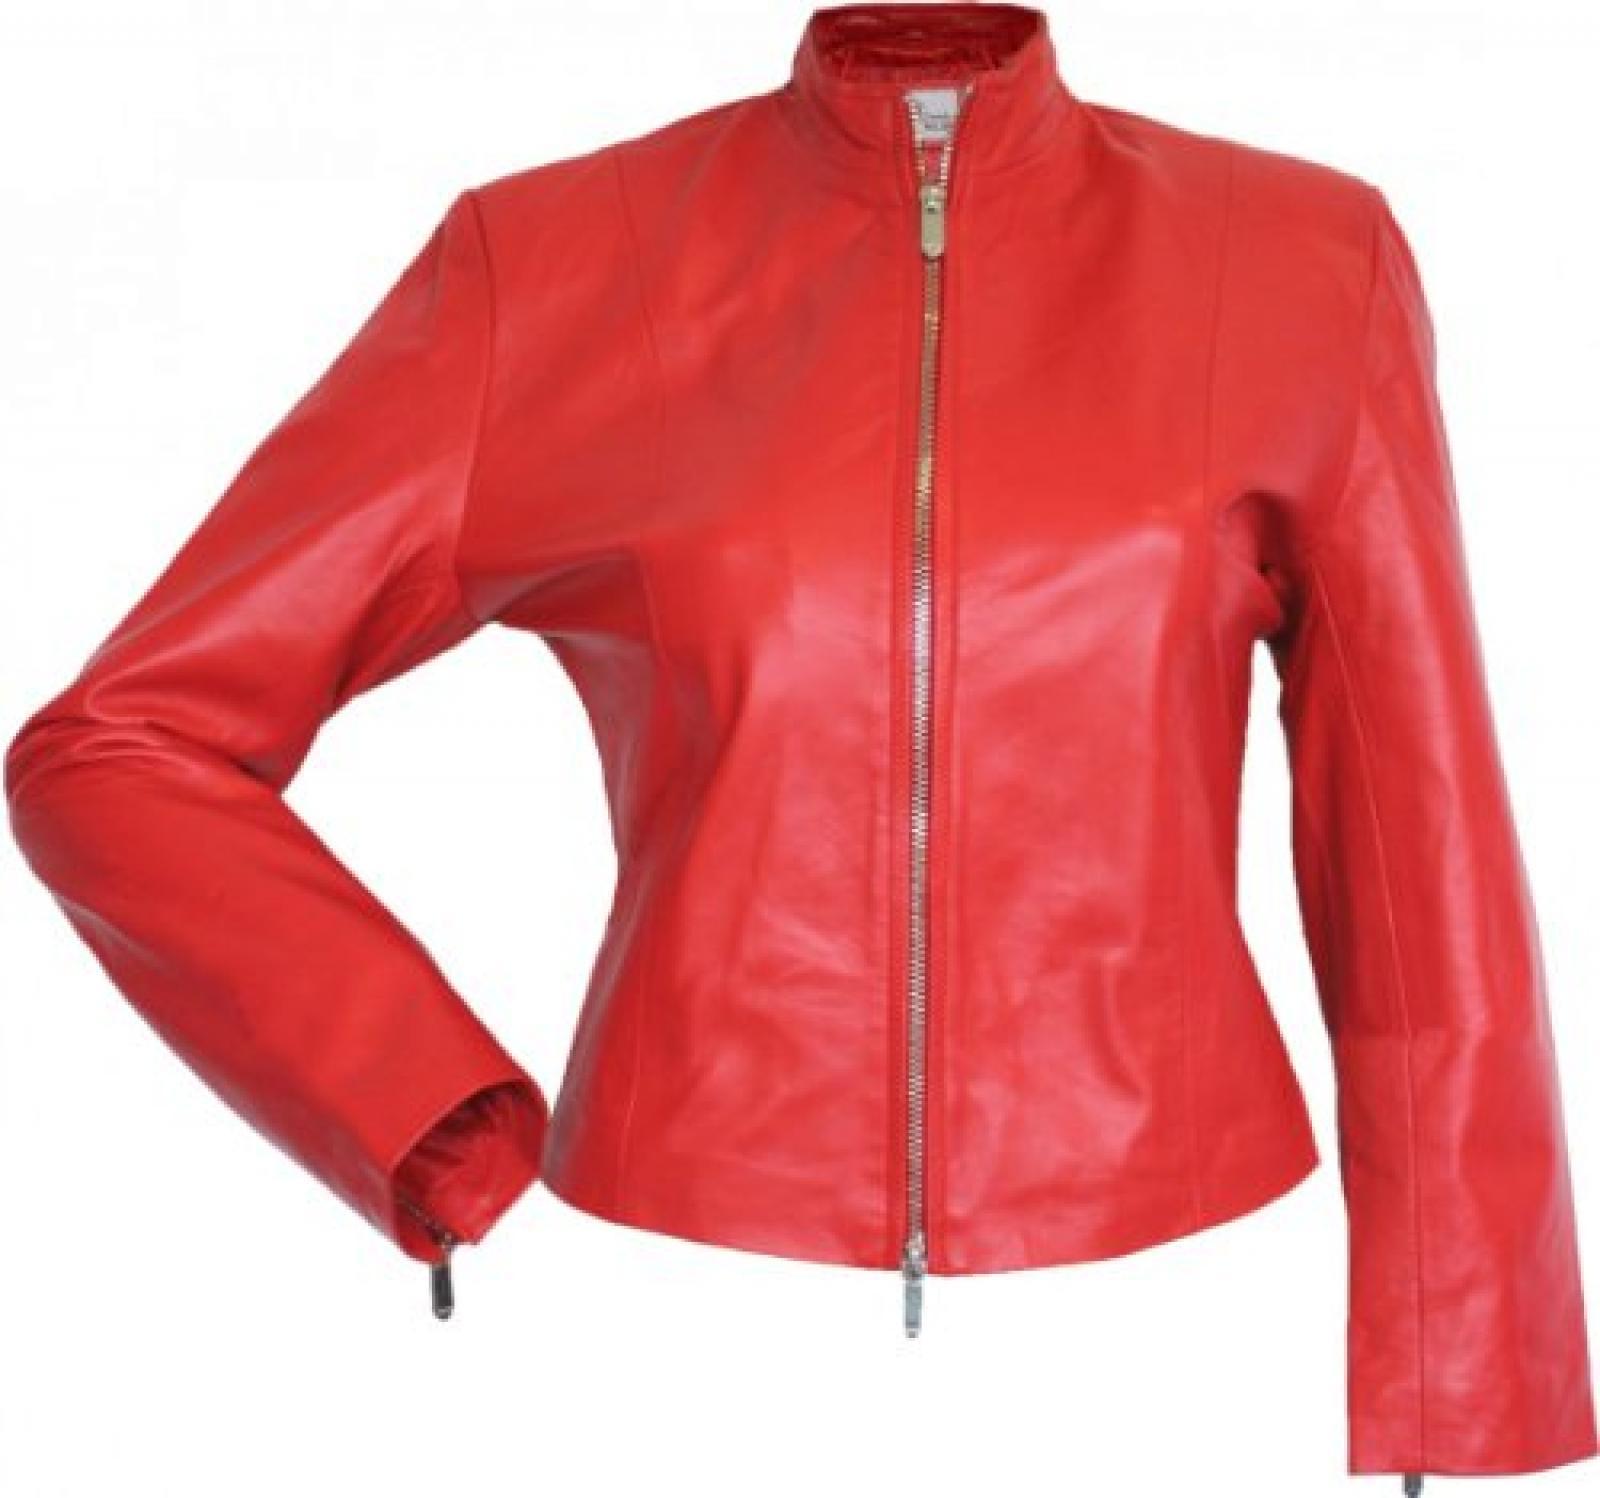 Damen Lederjacke Trend Fashion echtleder Jacke aus Lammnappa Leder Rot